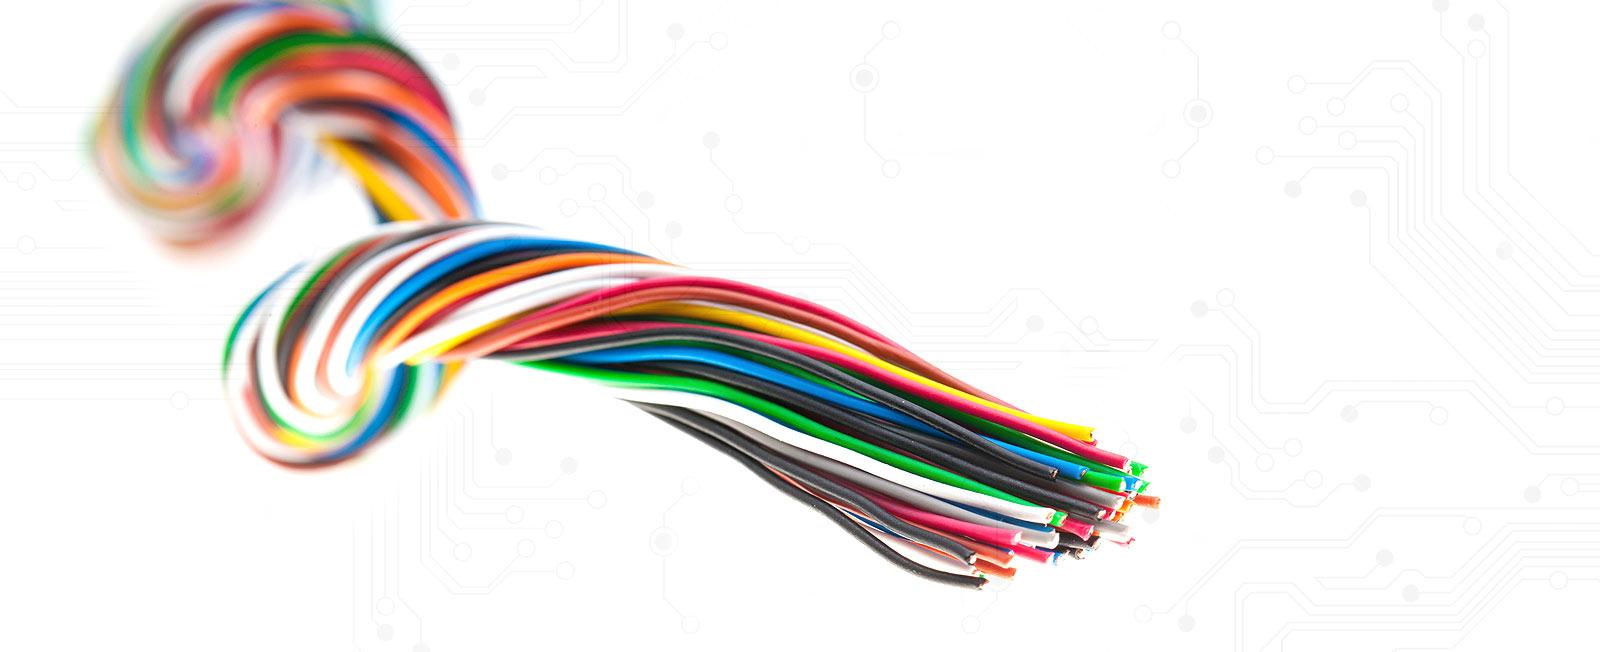 Home Rajdhani Wiring Cable Powering Responsibly